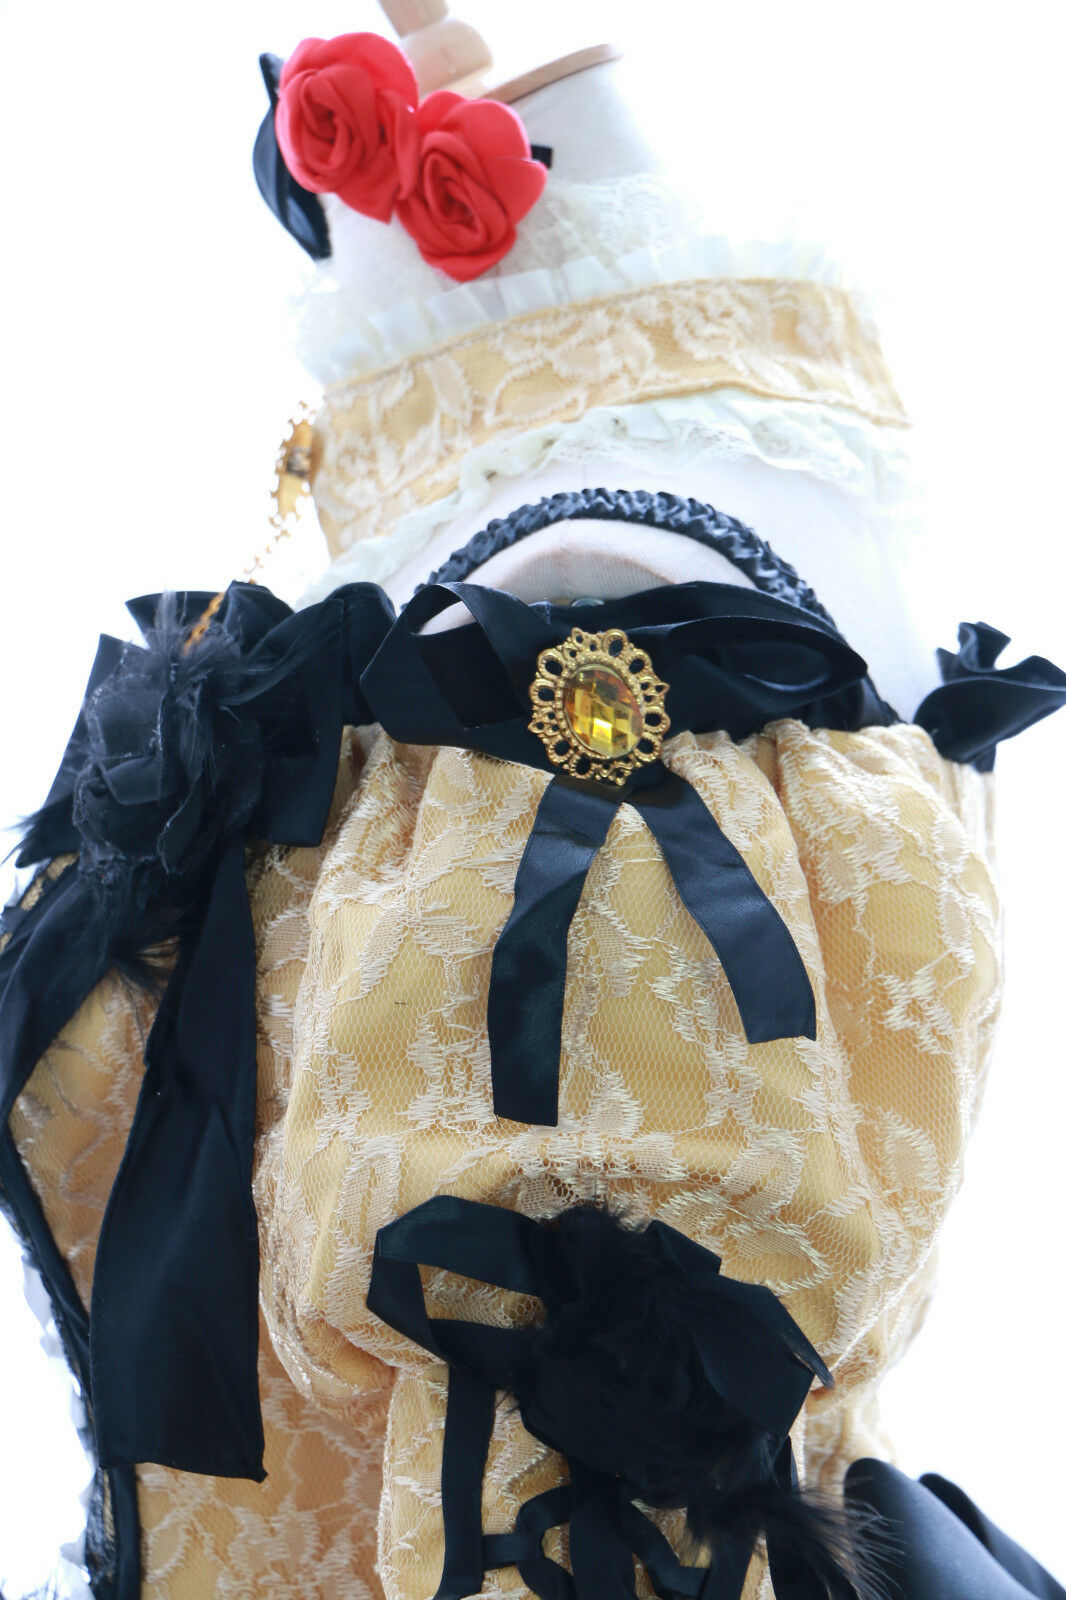 A-188 rin Cosplay victorian costume gothique robe de bal bal bal robe Costume Dress N. mesure d646ed